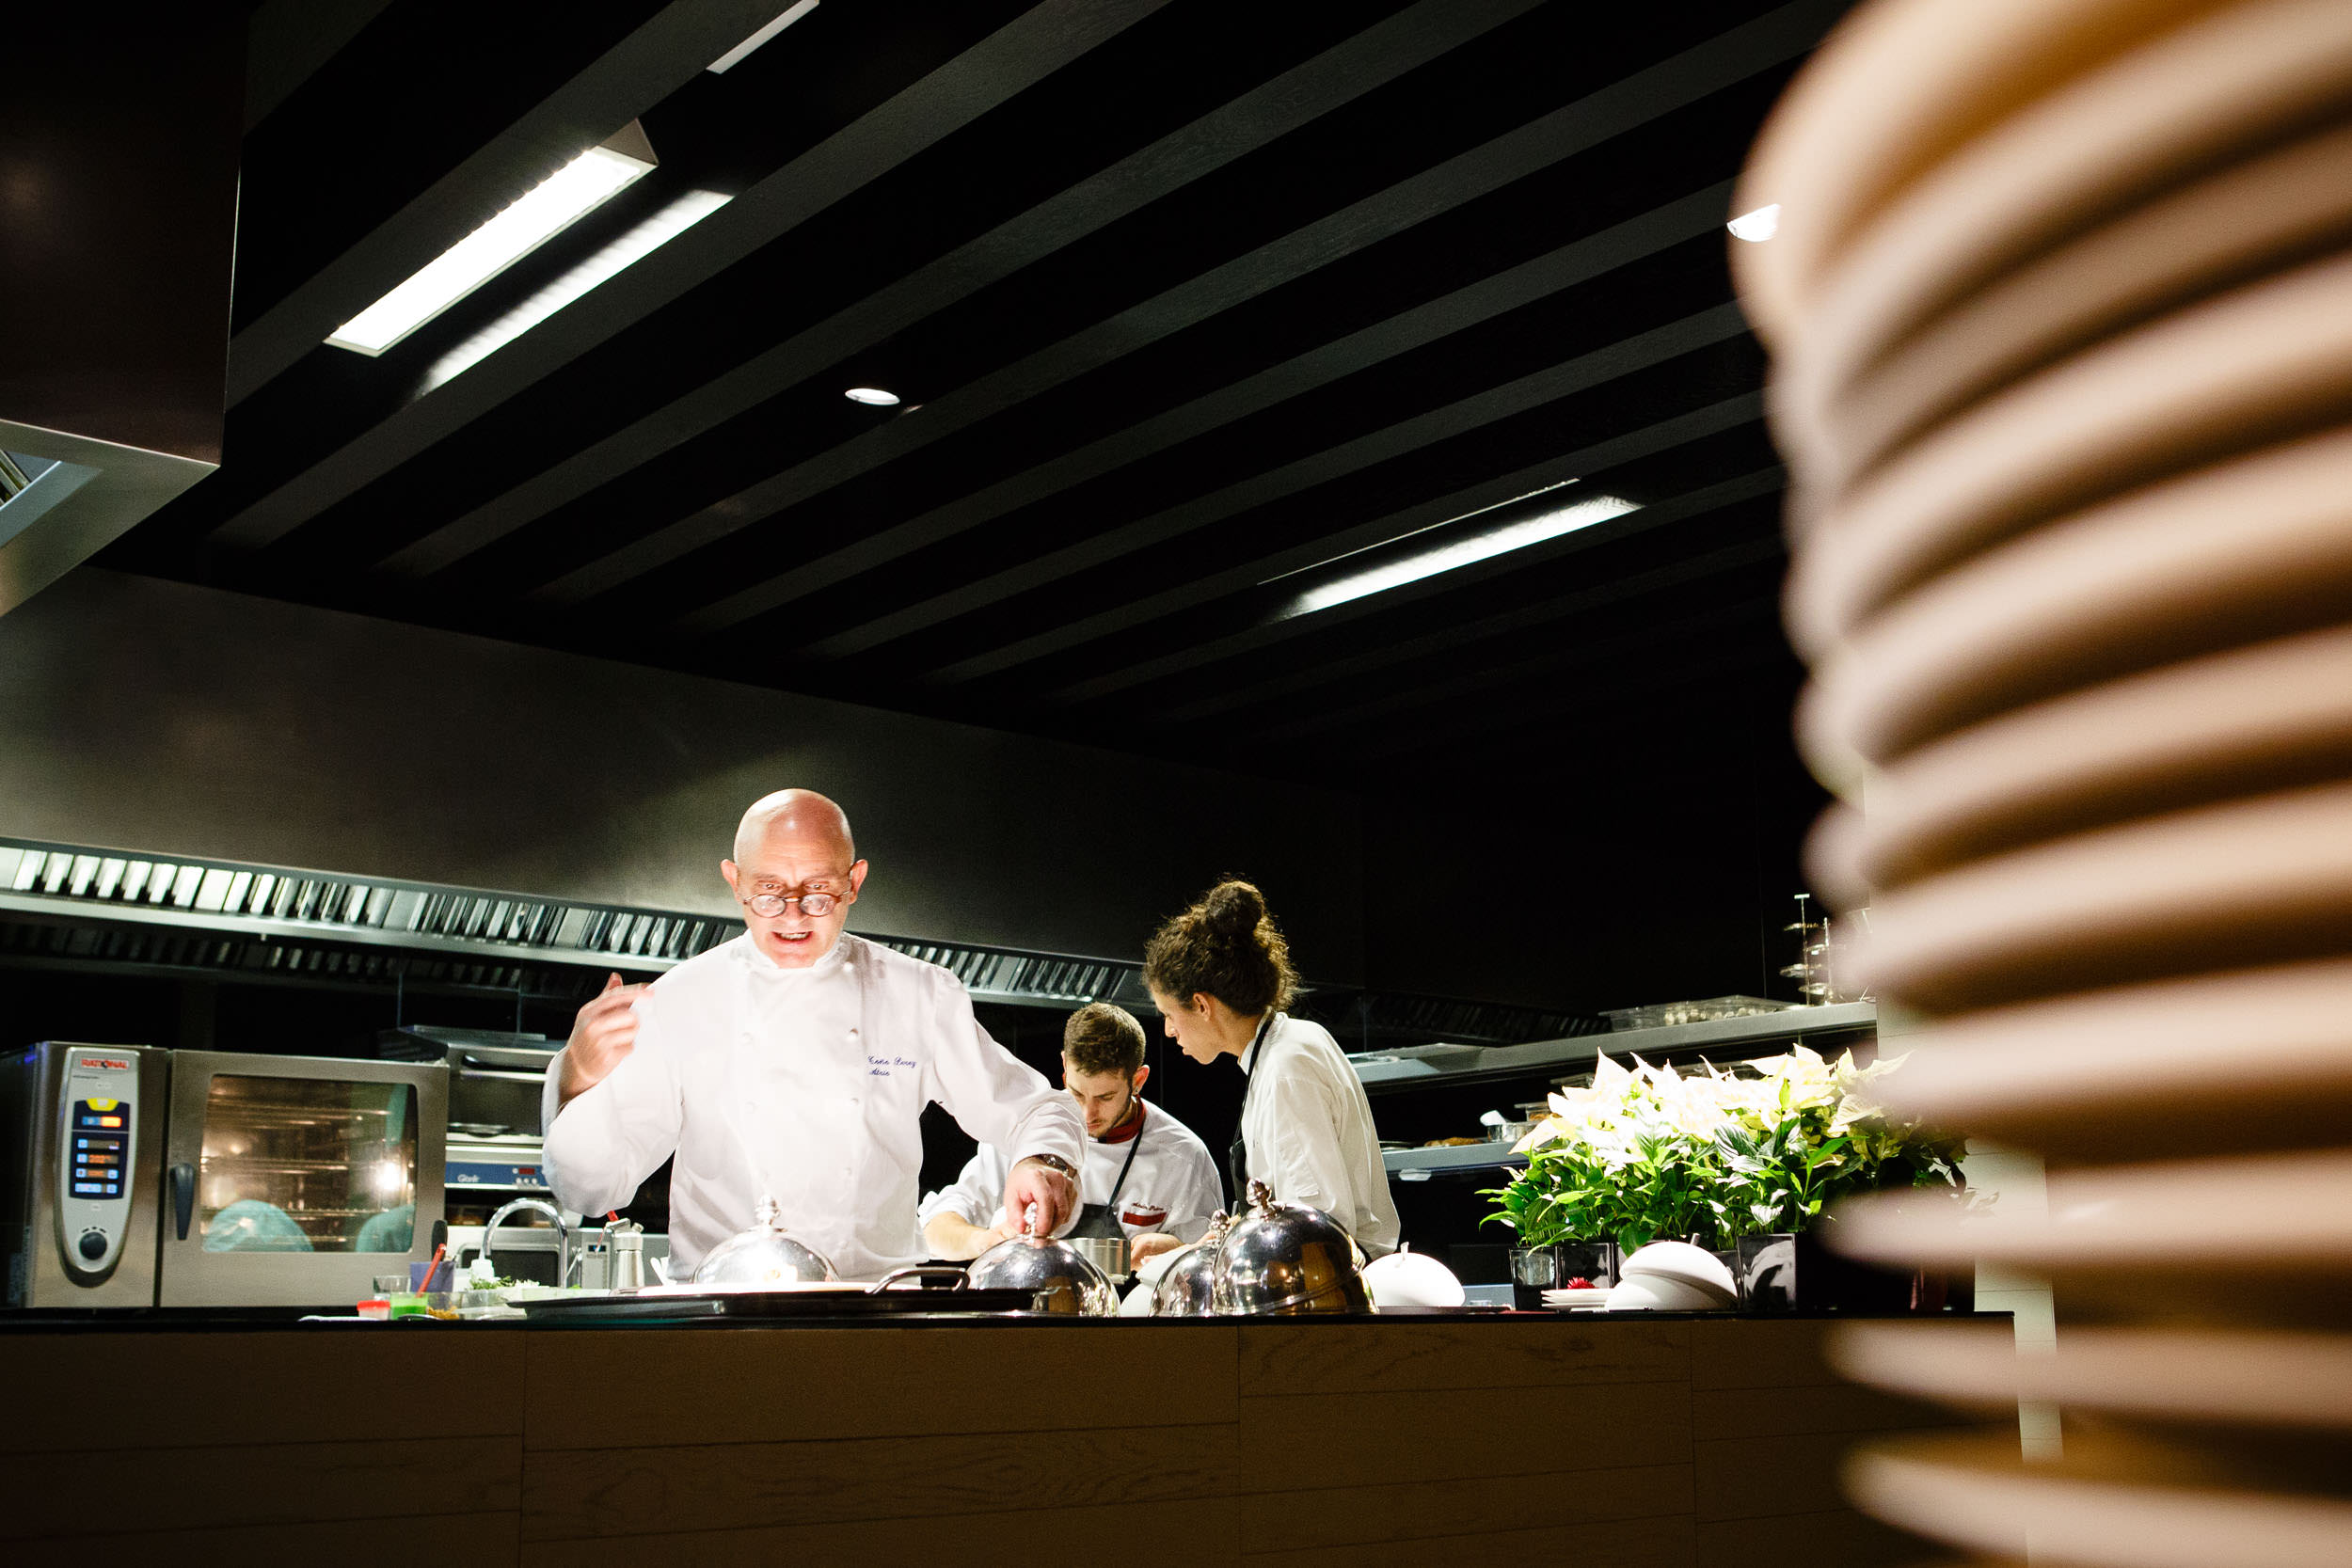 1/1/14 Two Michelin-star chef Toño Pérez at work in Restaurante Atrio, Cáceres, Extremadura, Spain. Photo by James Sturcke Fotografía | www.sturcke.org